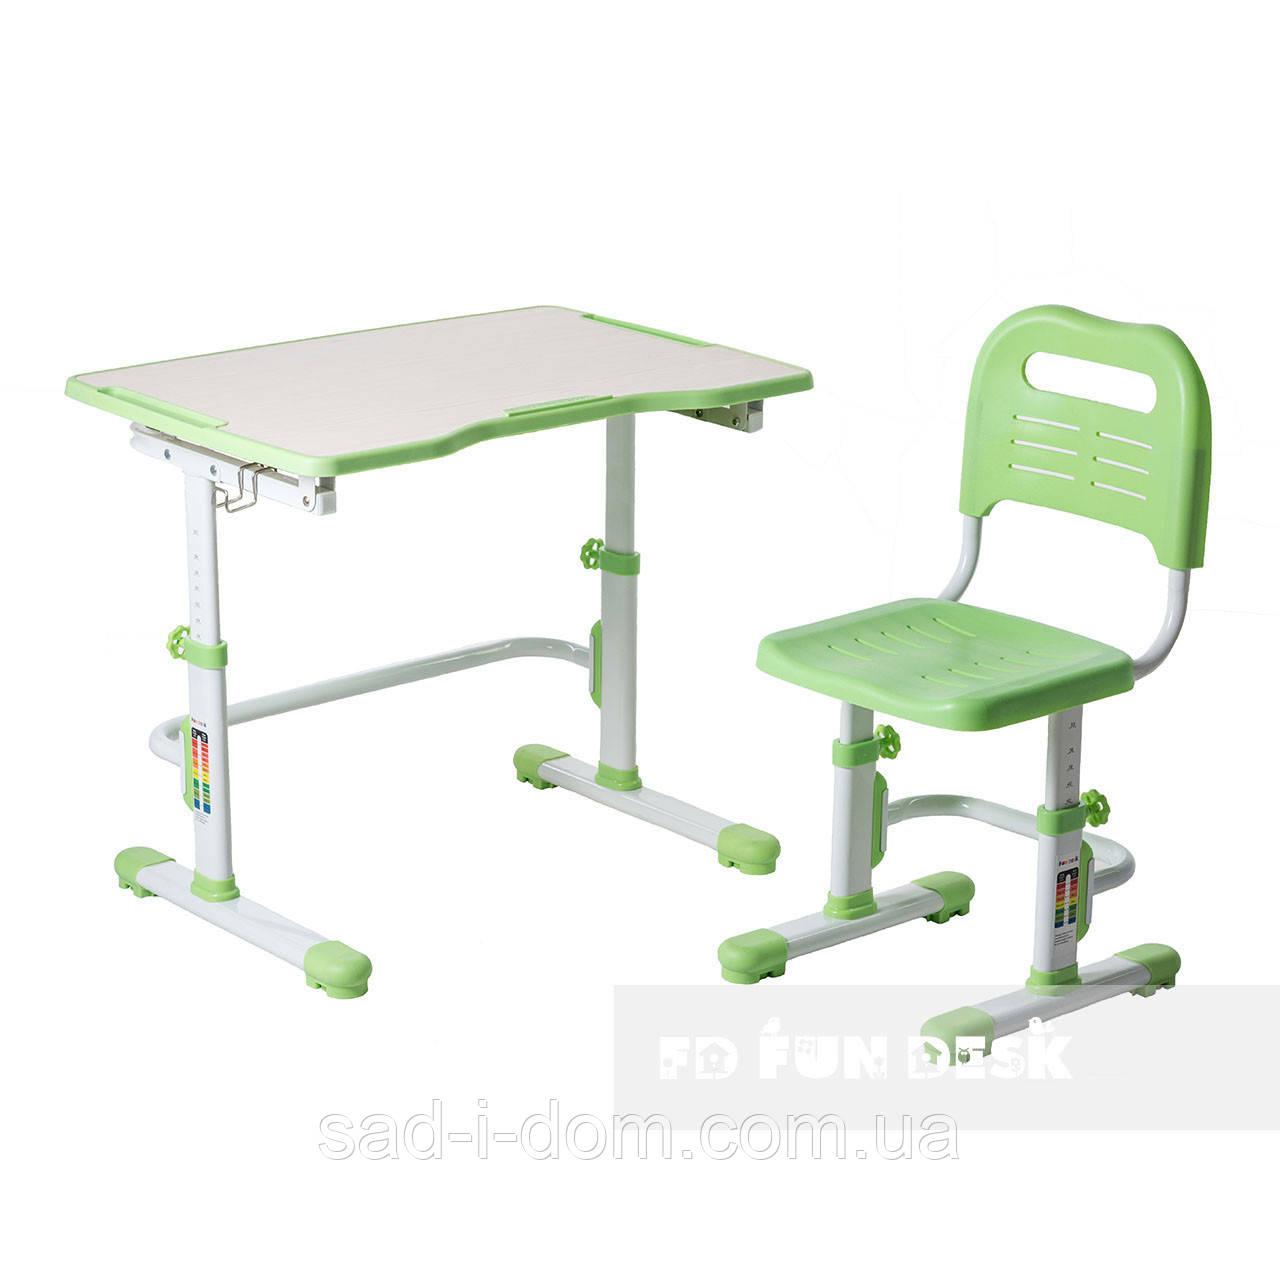 Комплект парта + стул трансформеры Vivo II Green FUNDESK